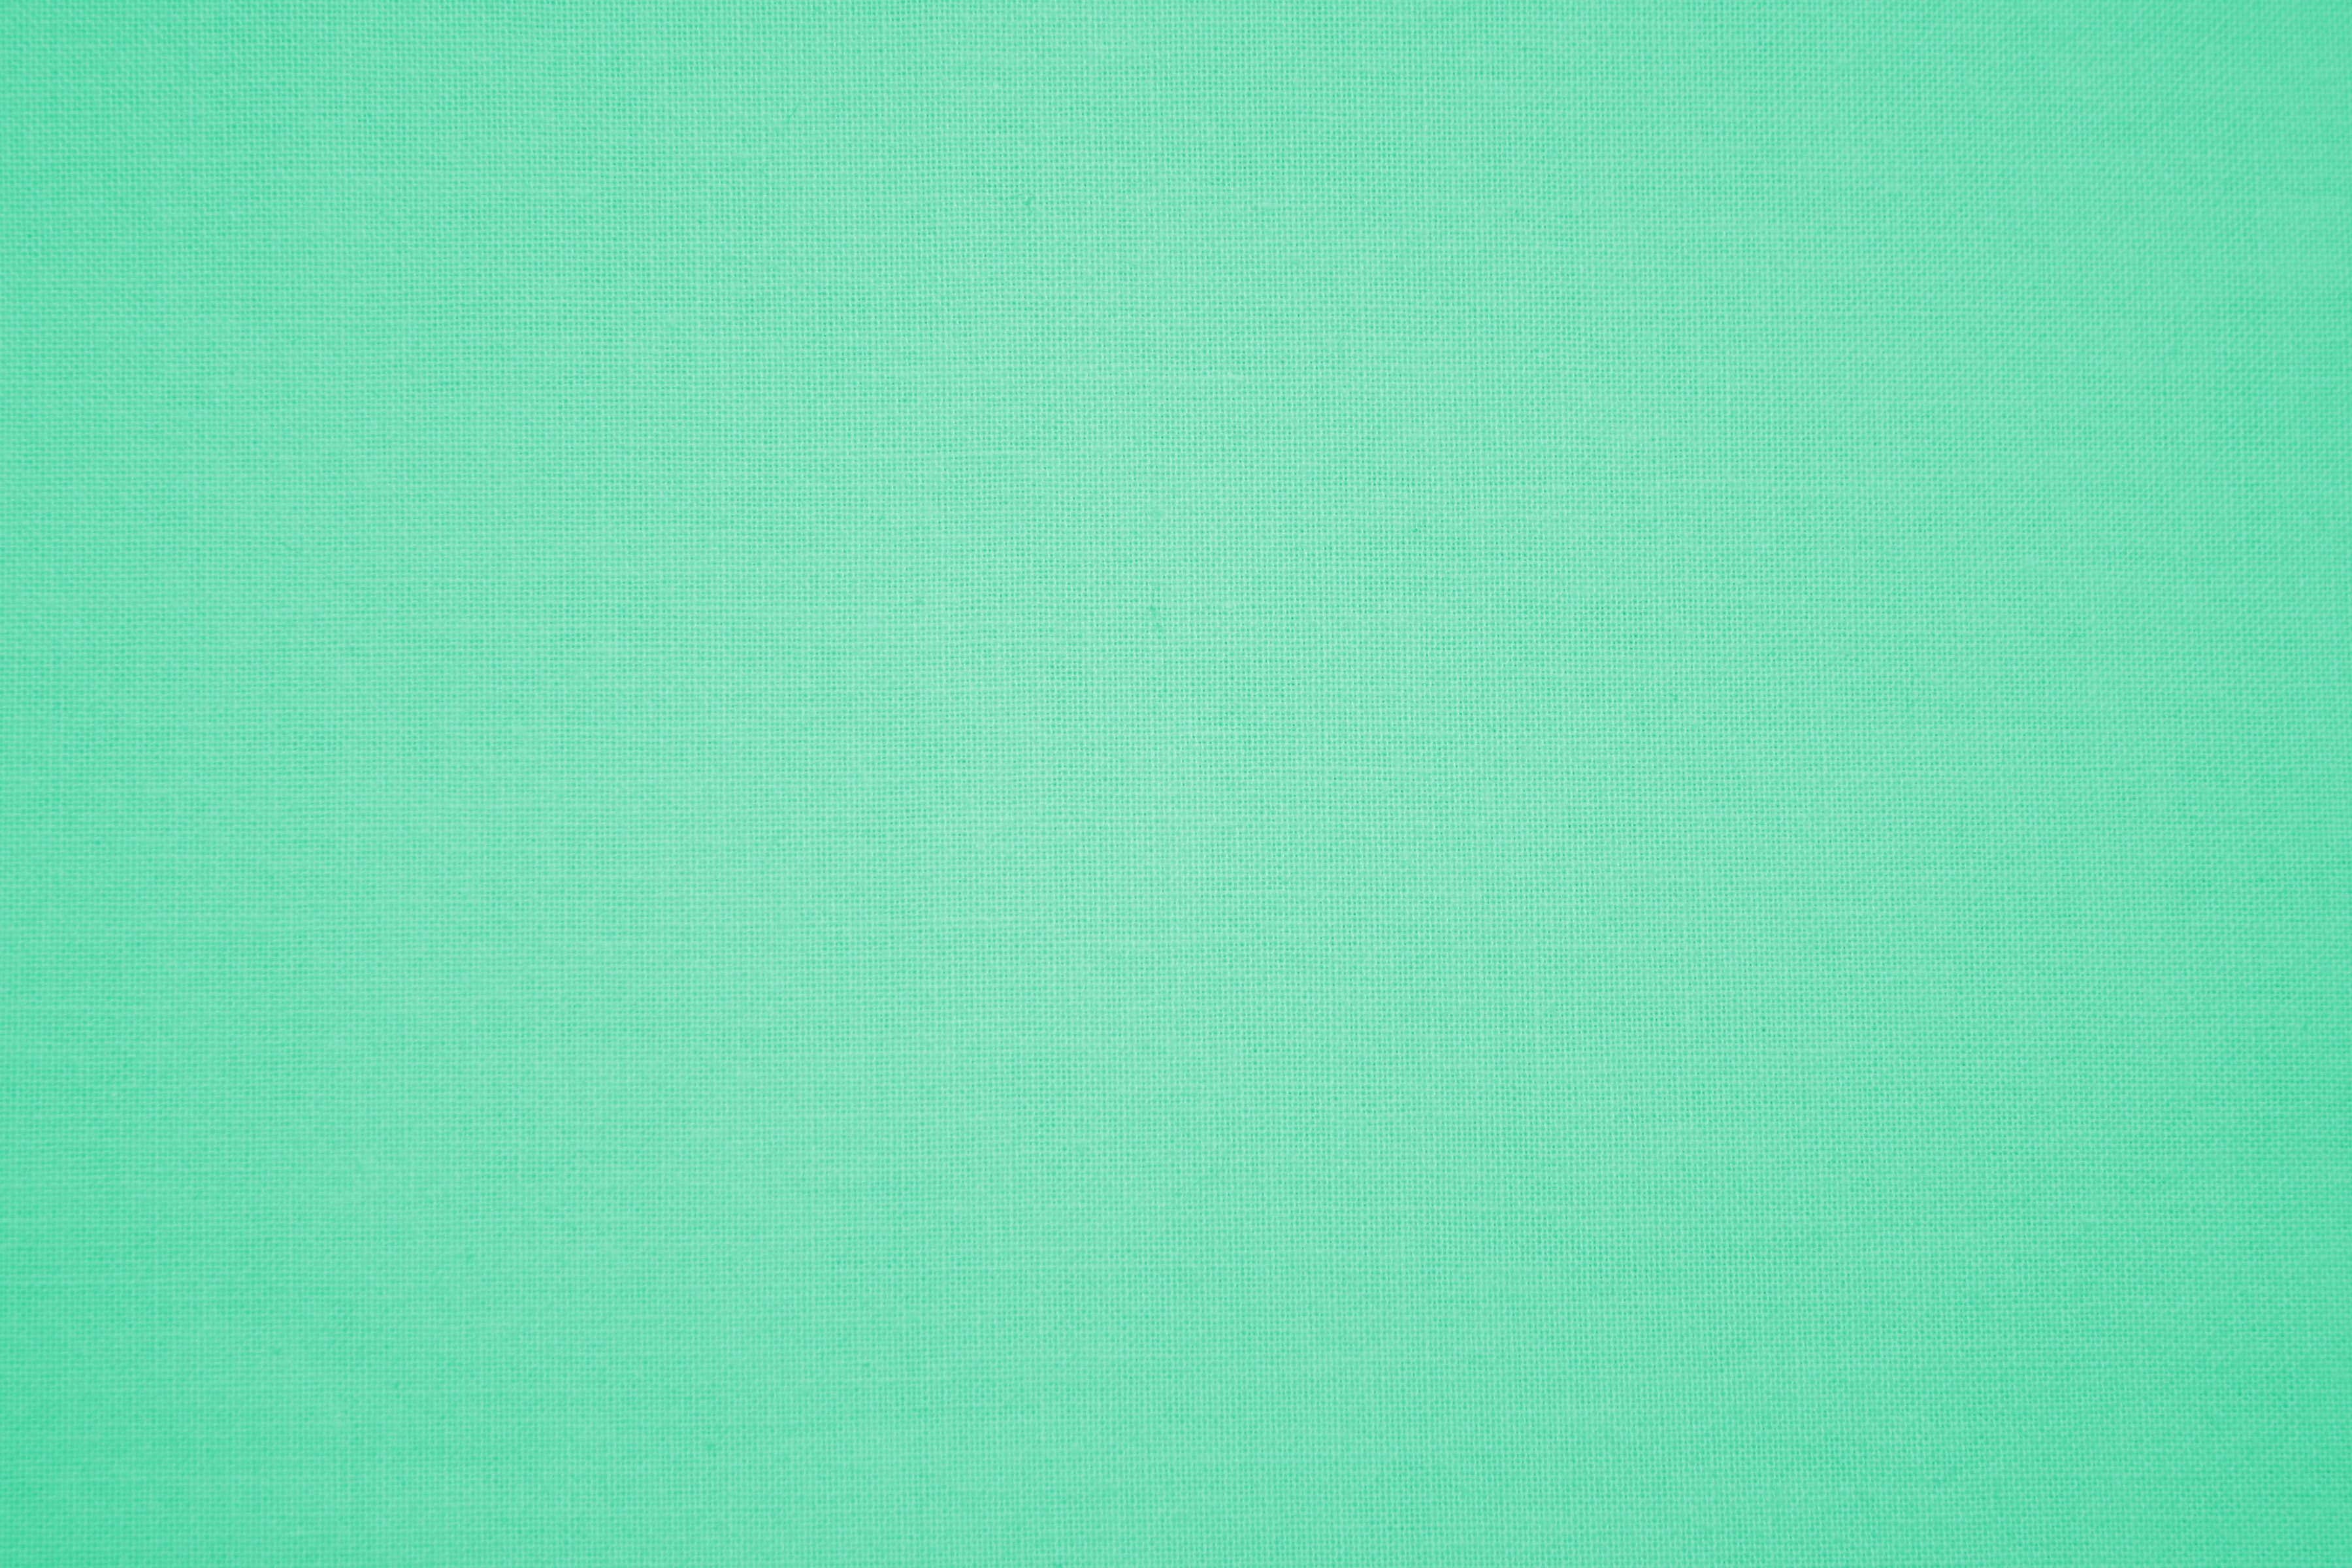 Aqua Colored Wallpaper Wallpapersafari